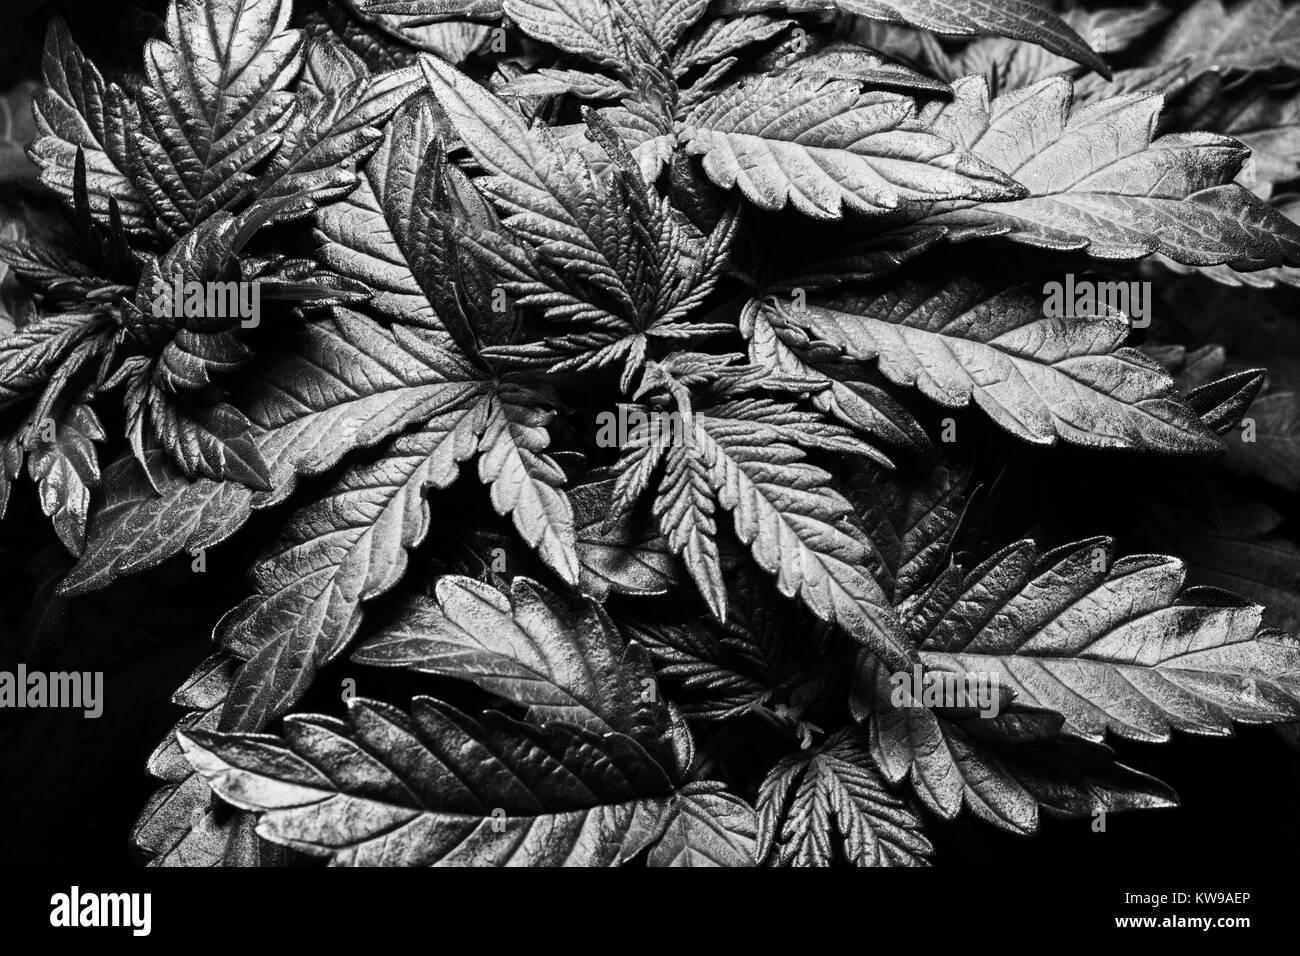 Marijuana black and white stock photos images alamy a dark toned black and white image of young marijuana plants stock image biocorpaavc Images